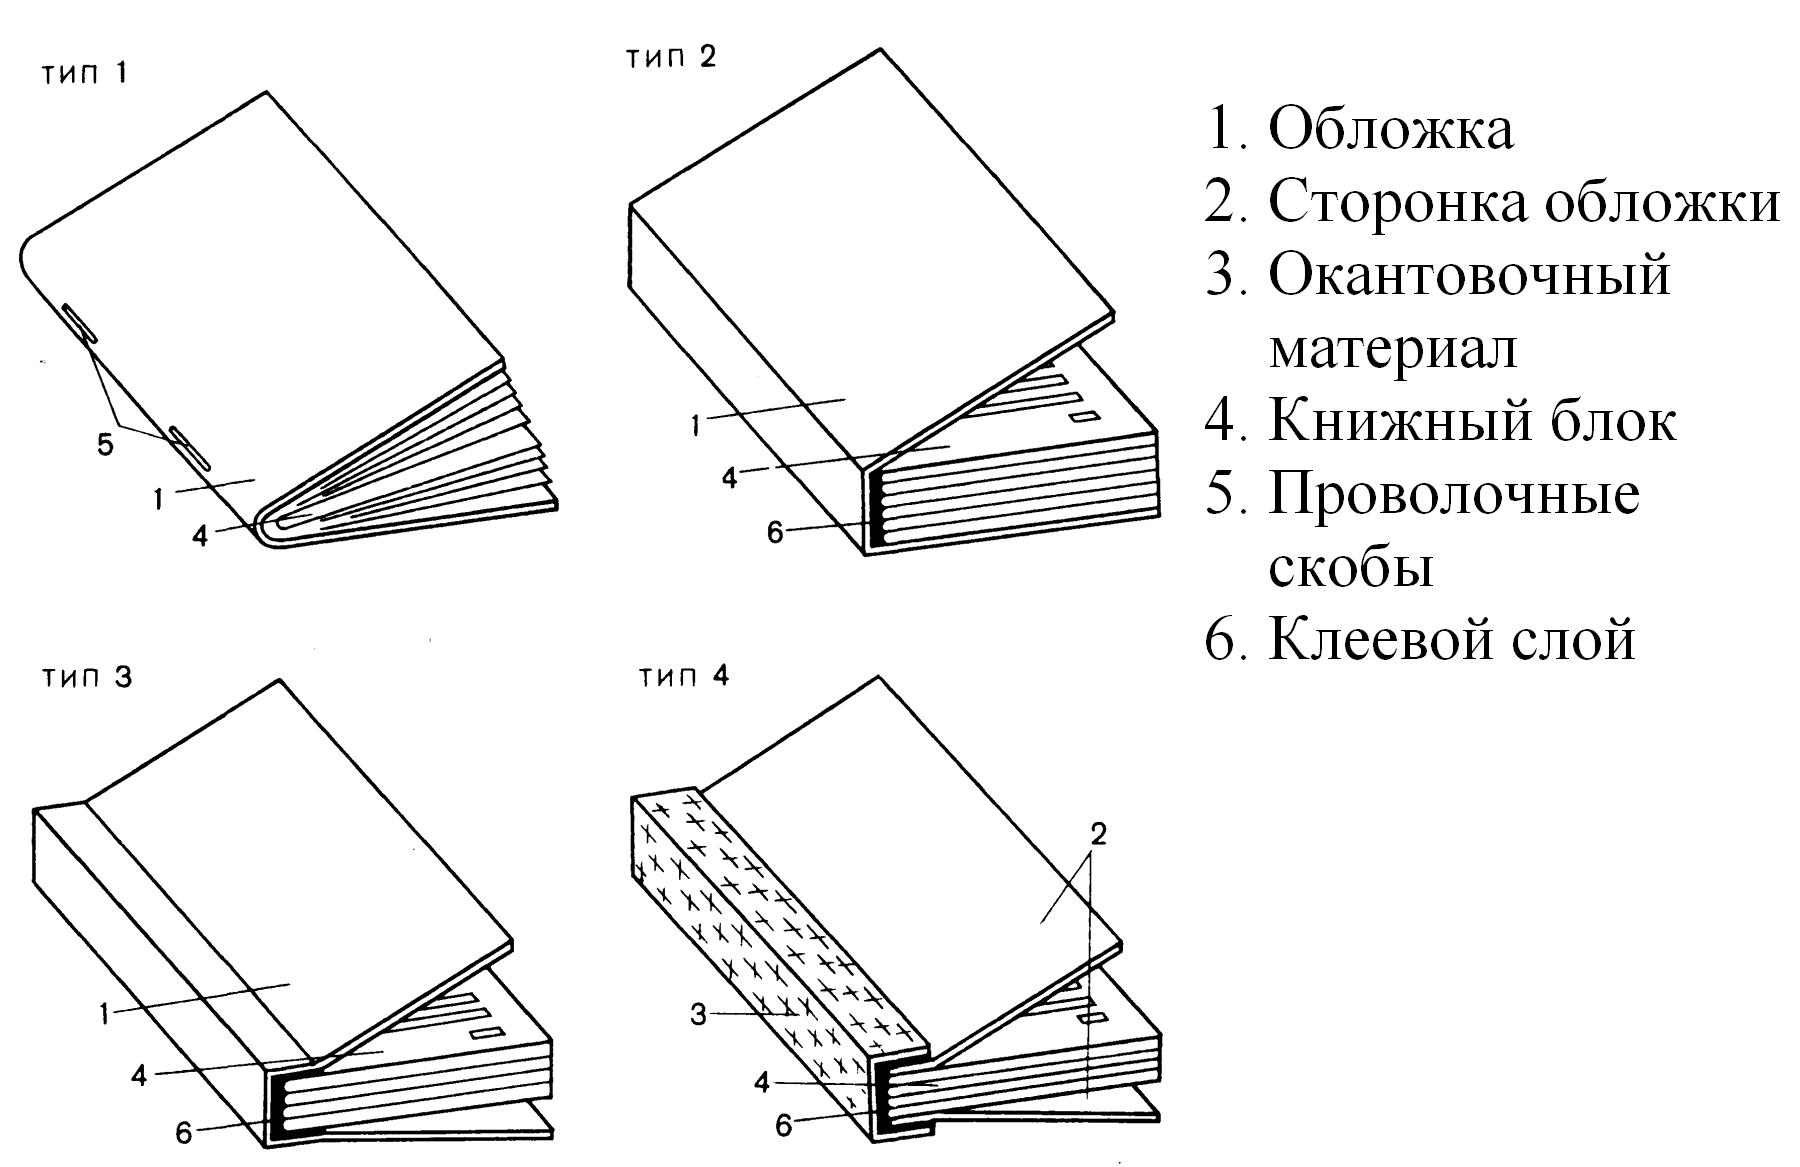 Типы переплетных крышек